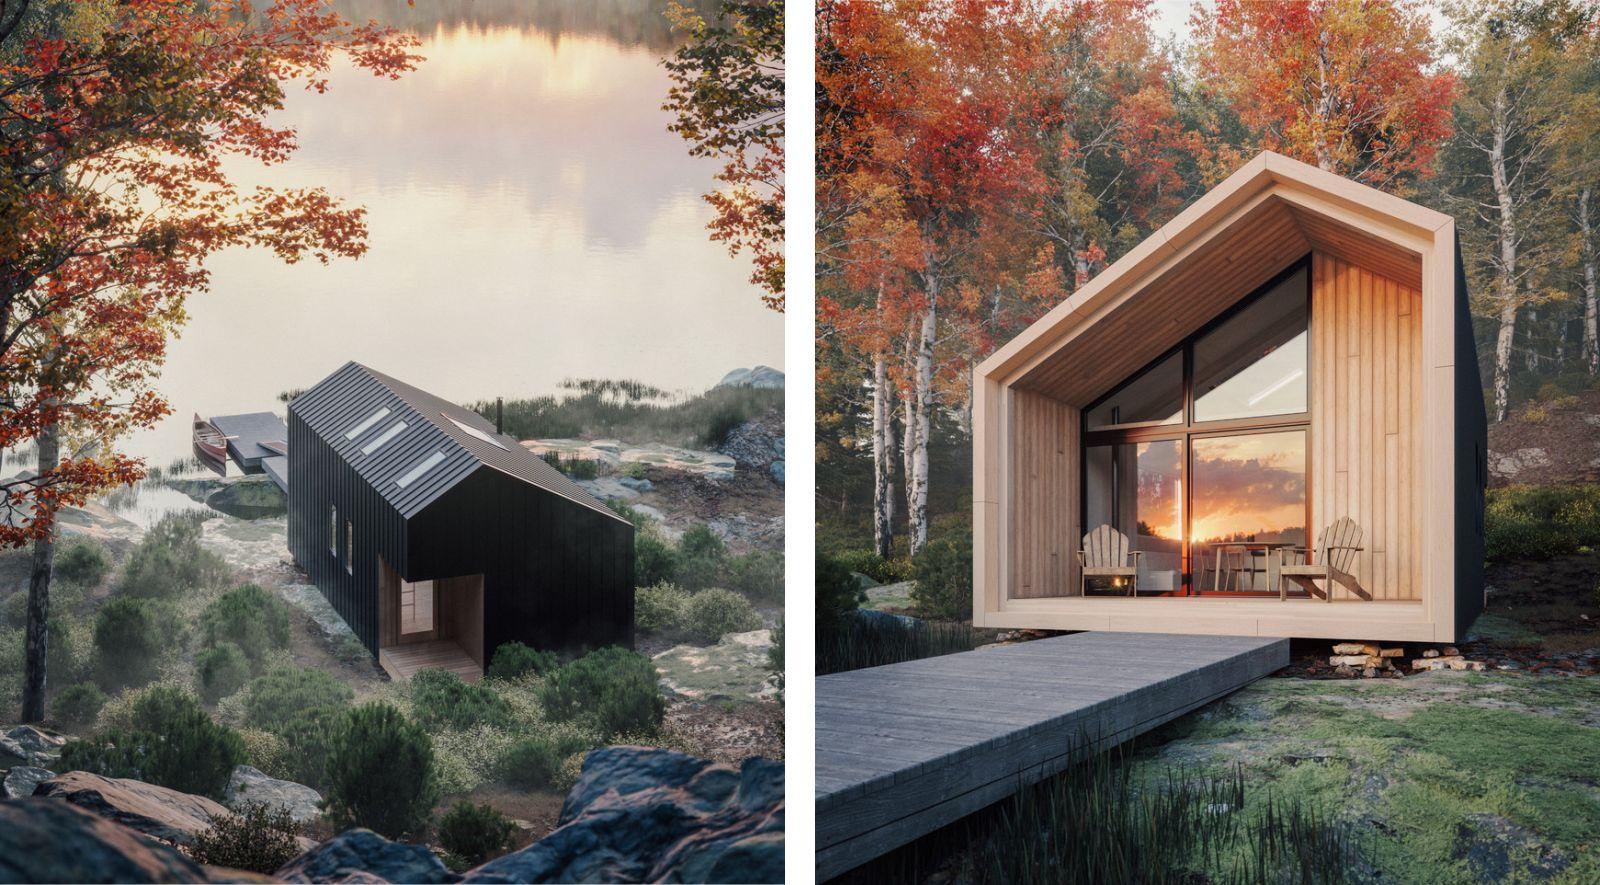 Backcountry Cabin